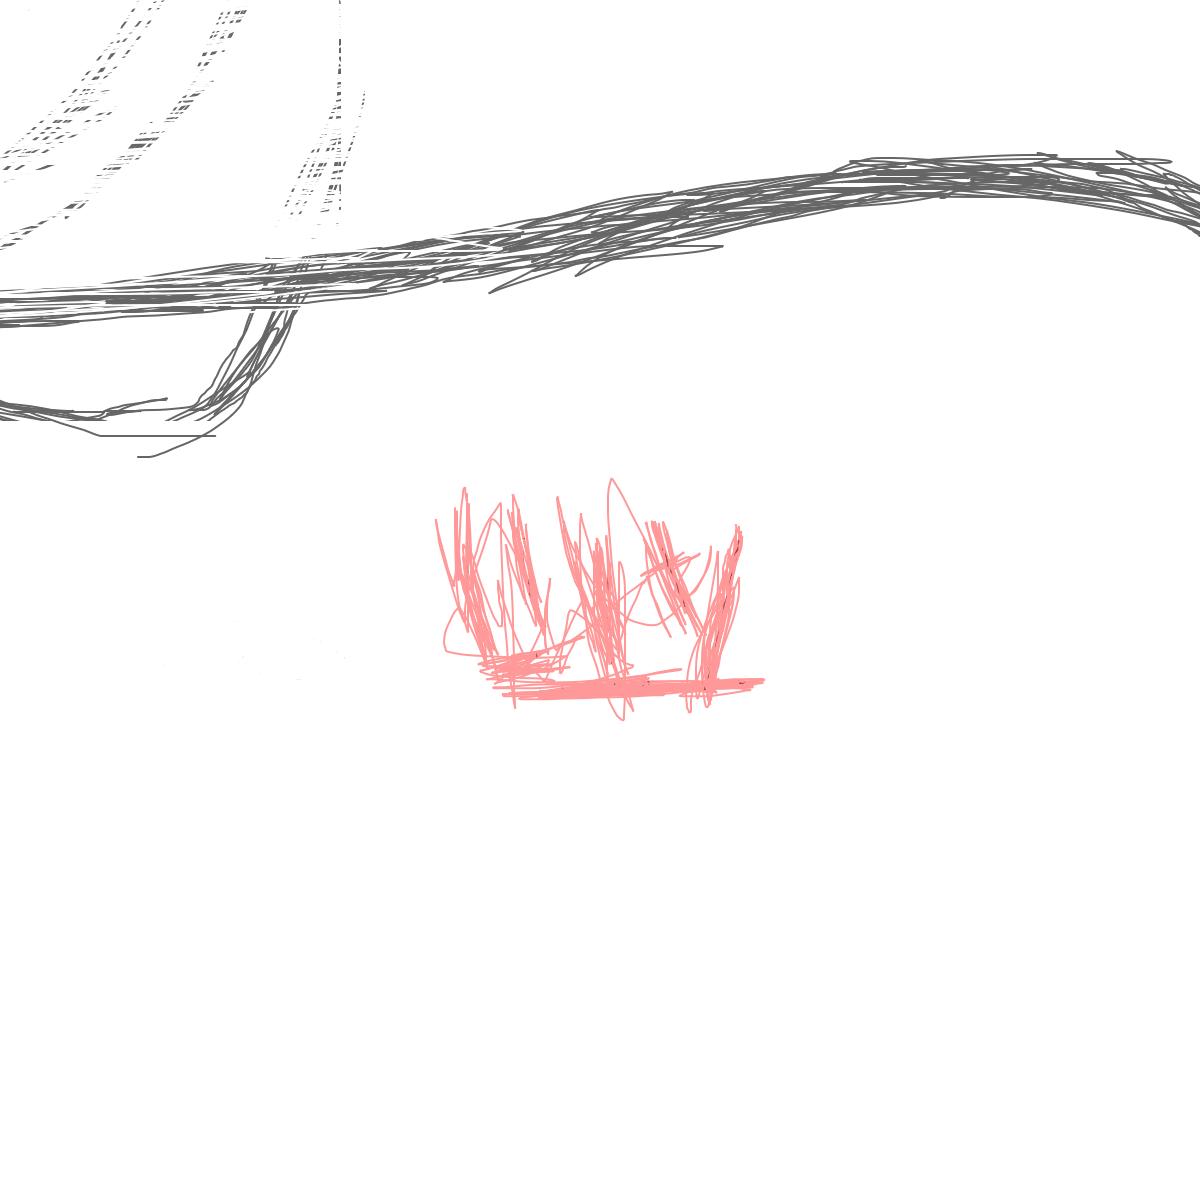 BAAAM drawing#4590 lat:44.3511276245117200lng: -4.6807255744934080